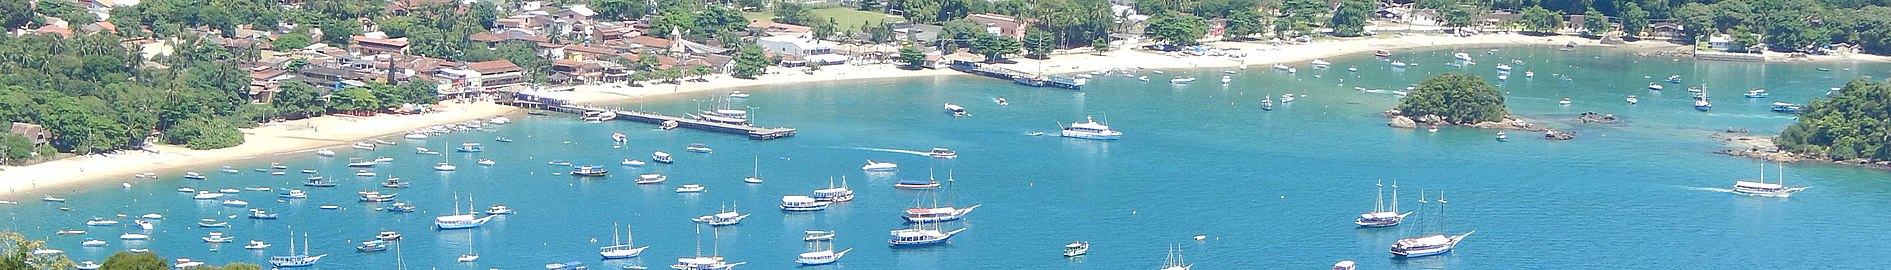 Ilha Grande Brazil RJ (cropped).jpg